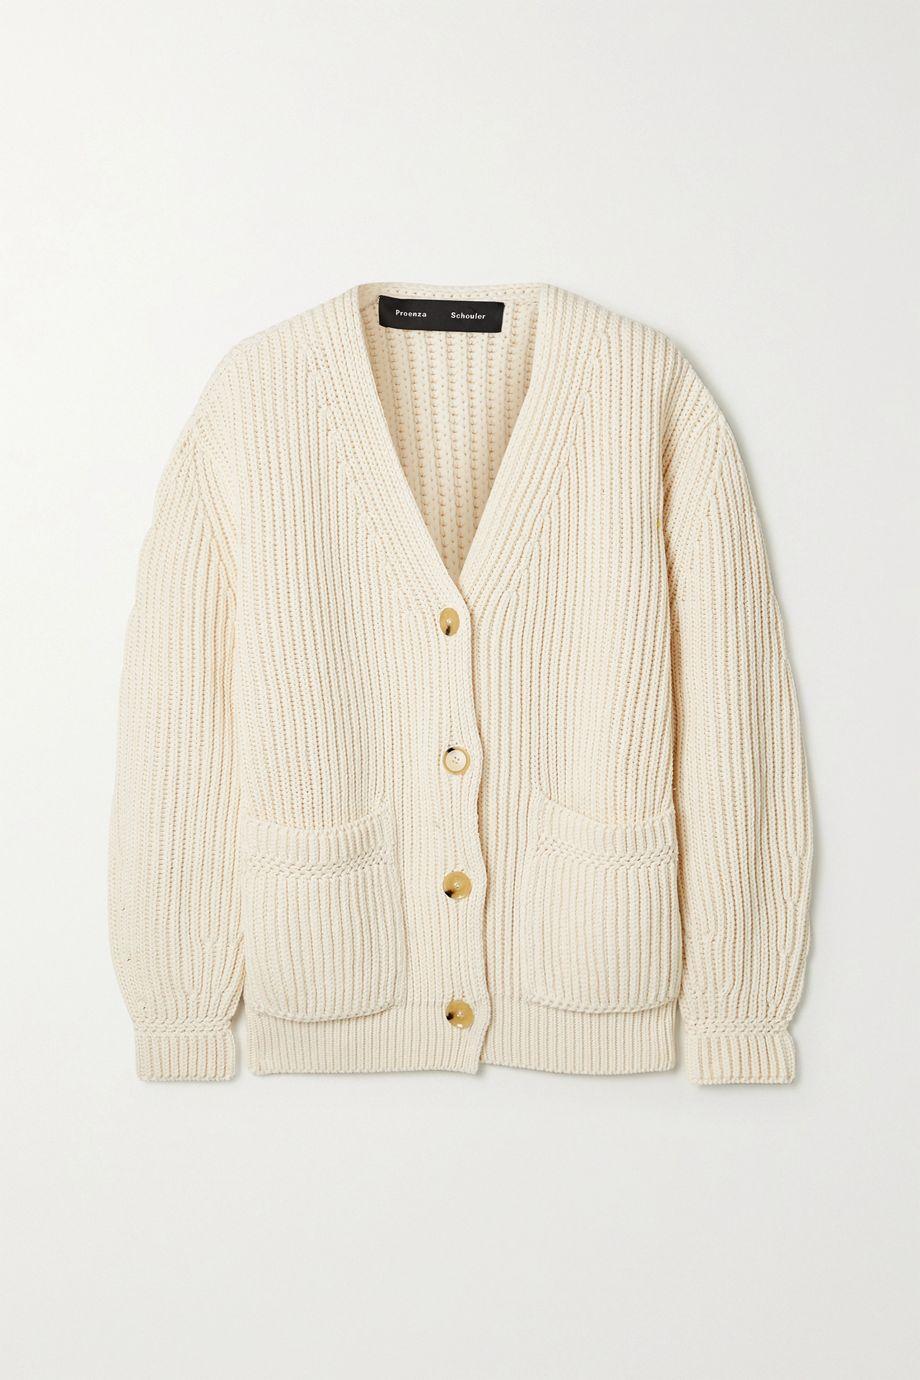 Proenza Schouler Ribbed cotton cardigan